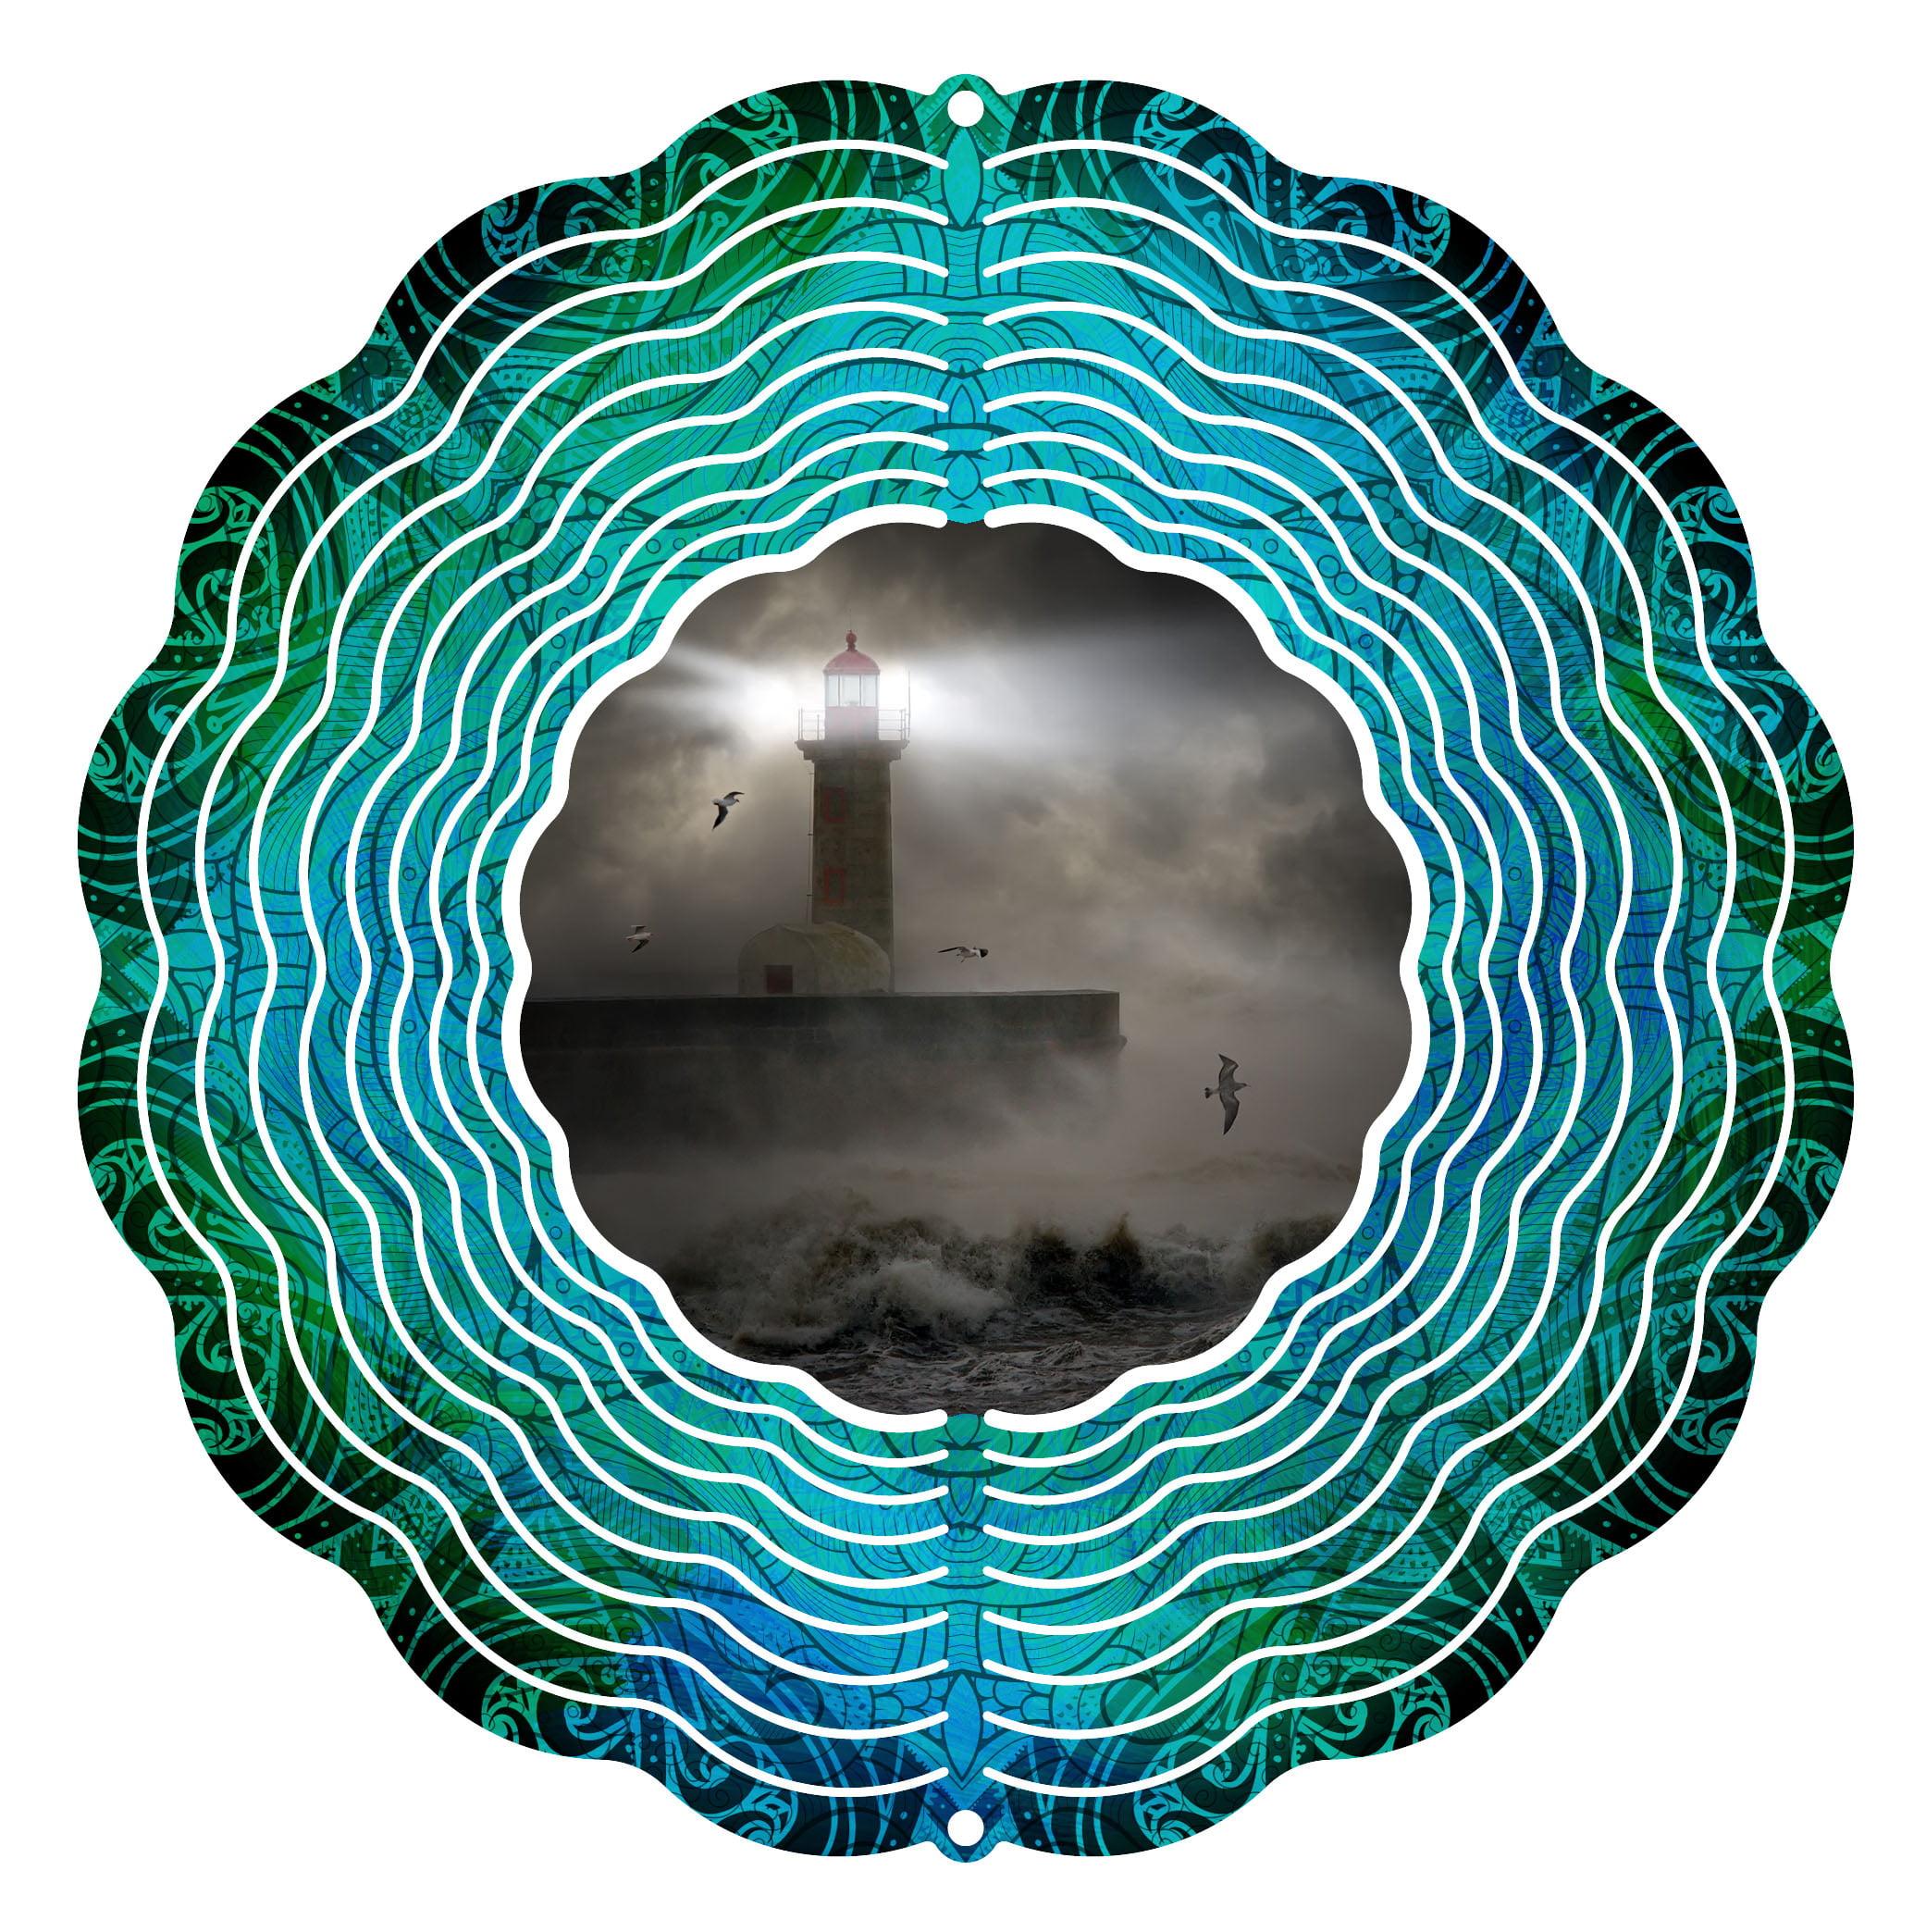 "Garden Wind Spinner Stormy Sea 10"" Wind Spinner by Next Innovations"